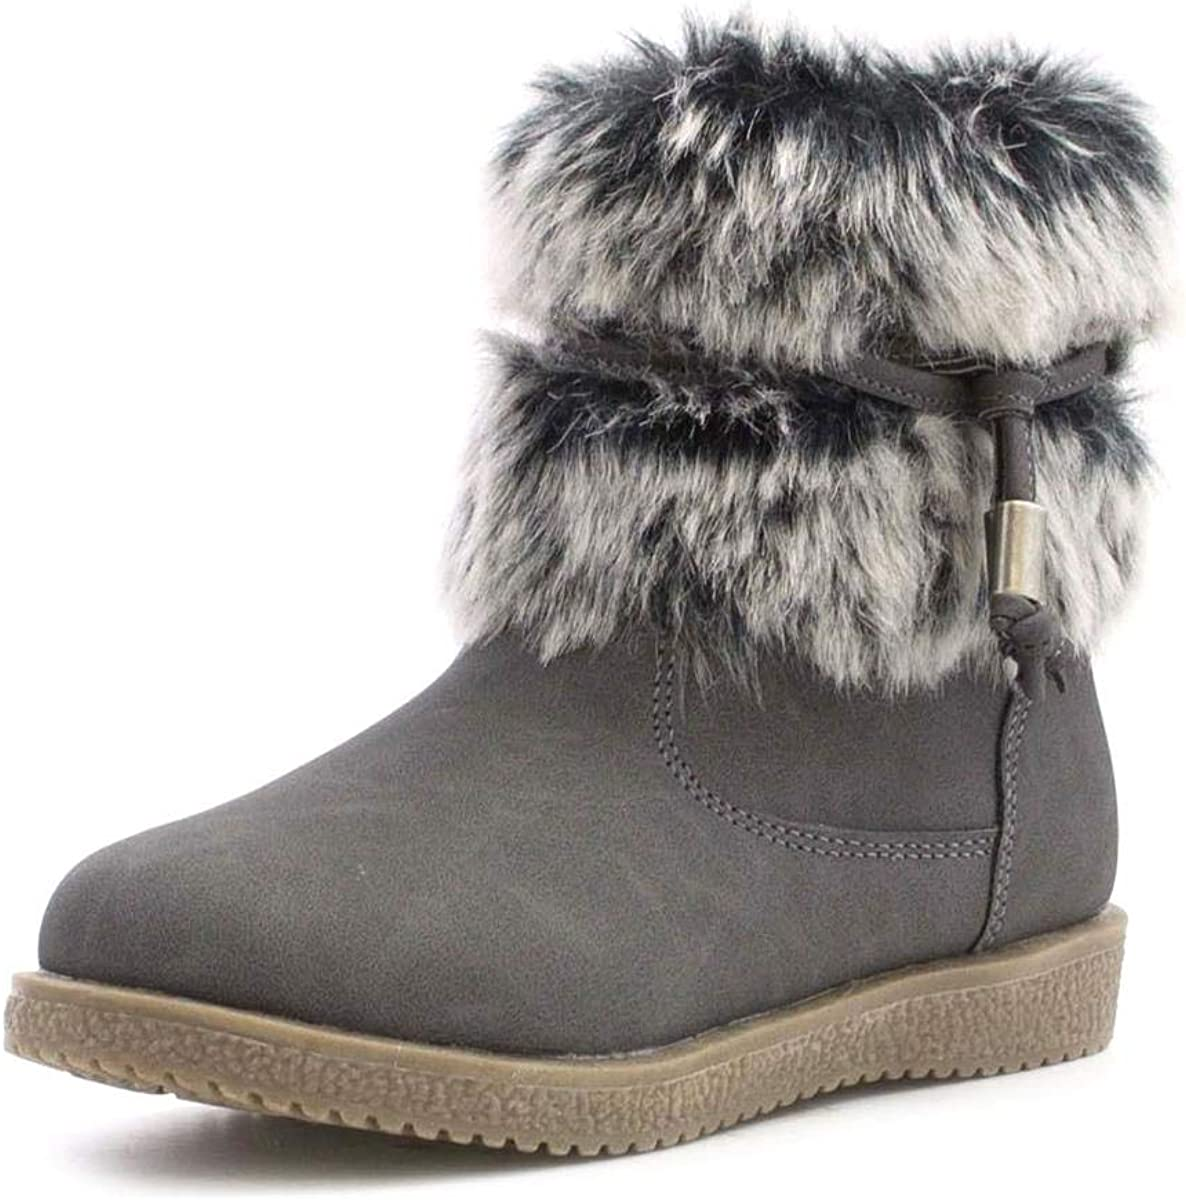 Walkright Girls Grey Tassel Faux Fur